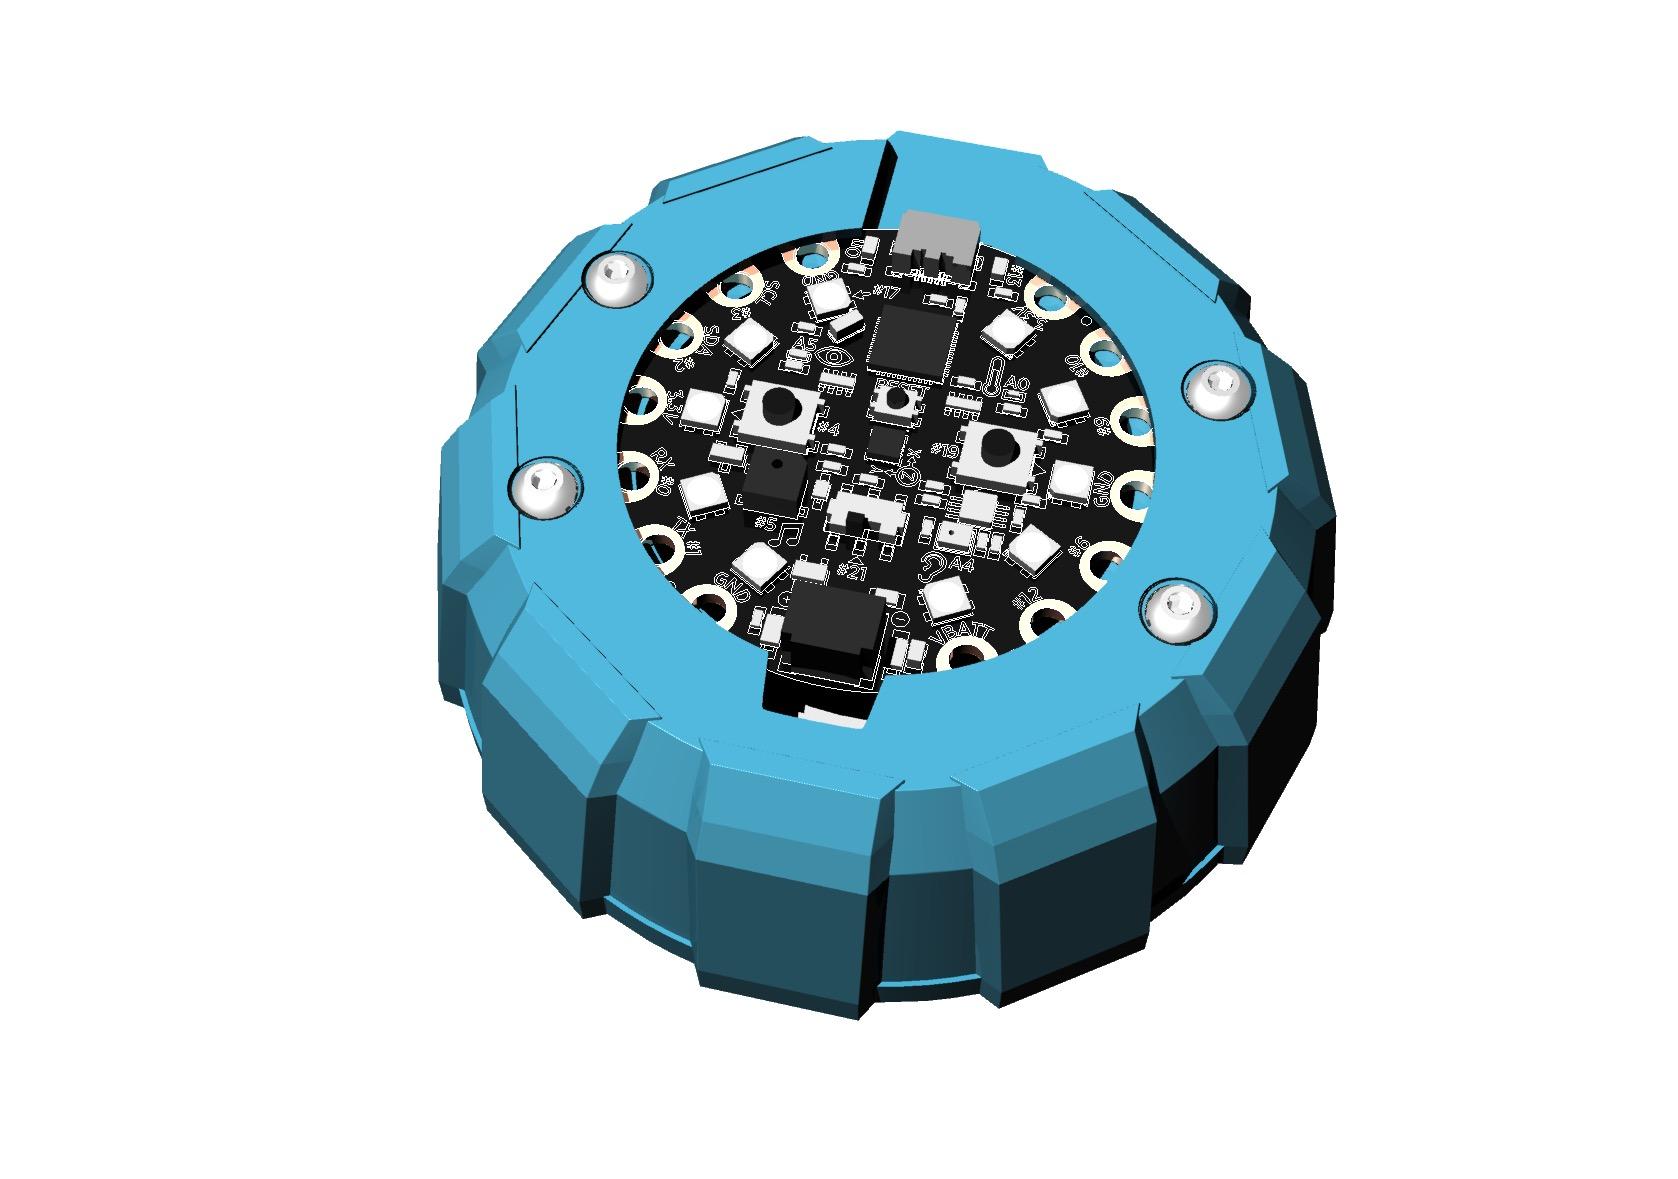 circuit_playground_CircuitPlayground_passVault_v005.jpg